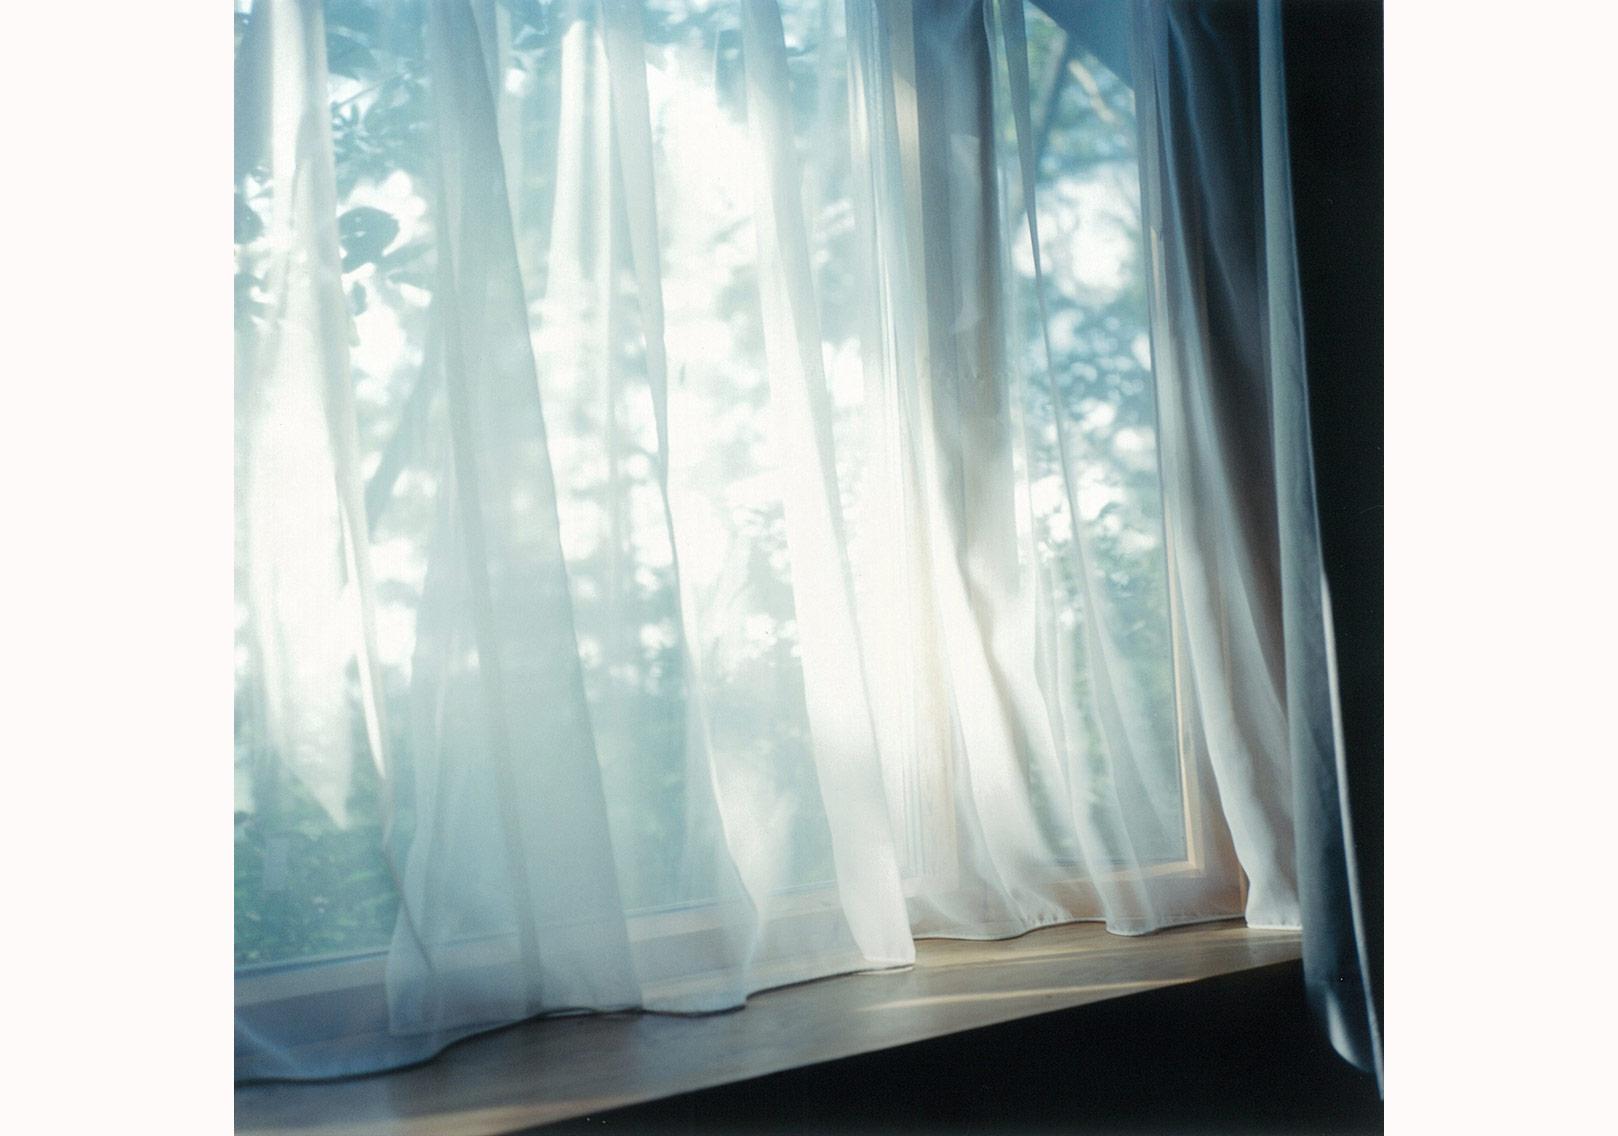 'İsimsiz', 'Illuminance' serisinden, 2011 © Rinko Kawauchi, Christophe Guye Galerieizniyle